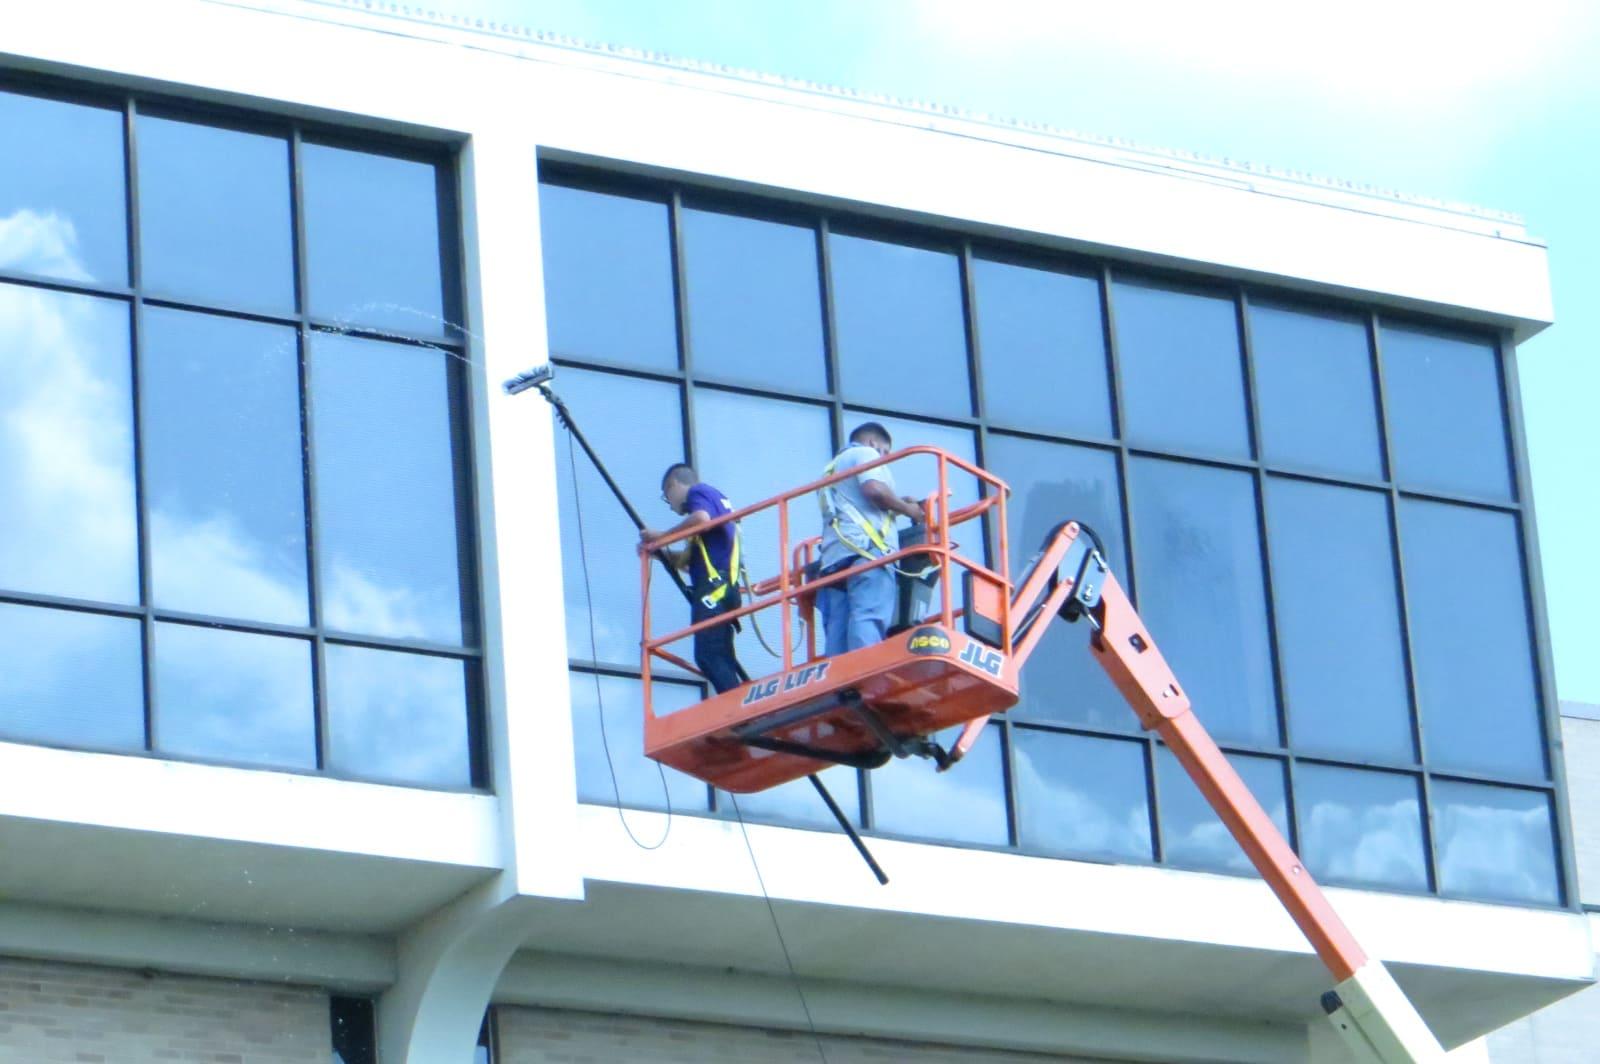 Nettoyage vitrerie nacelle